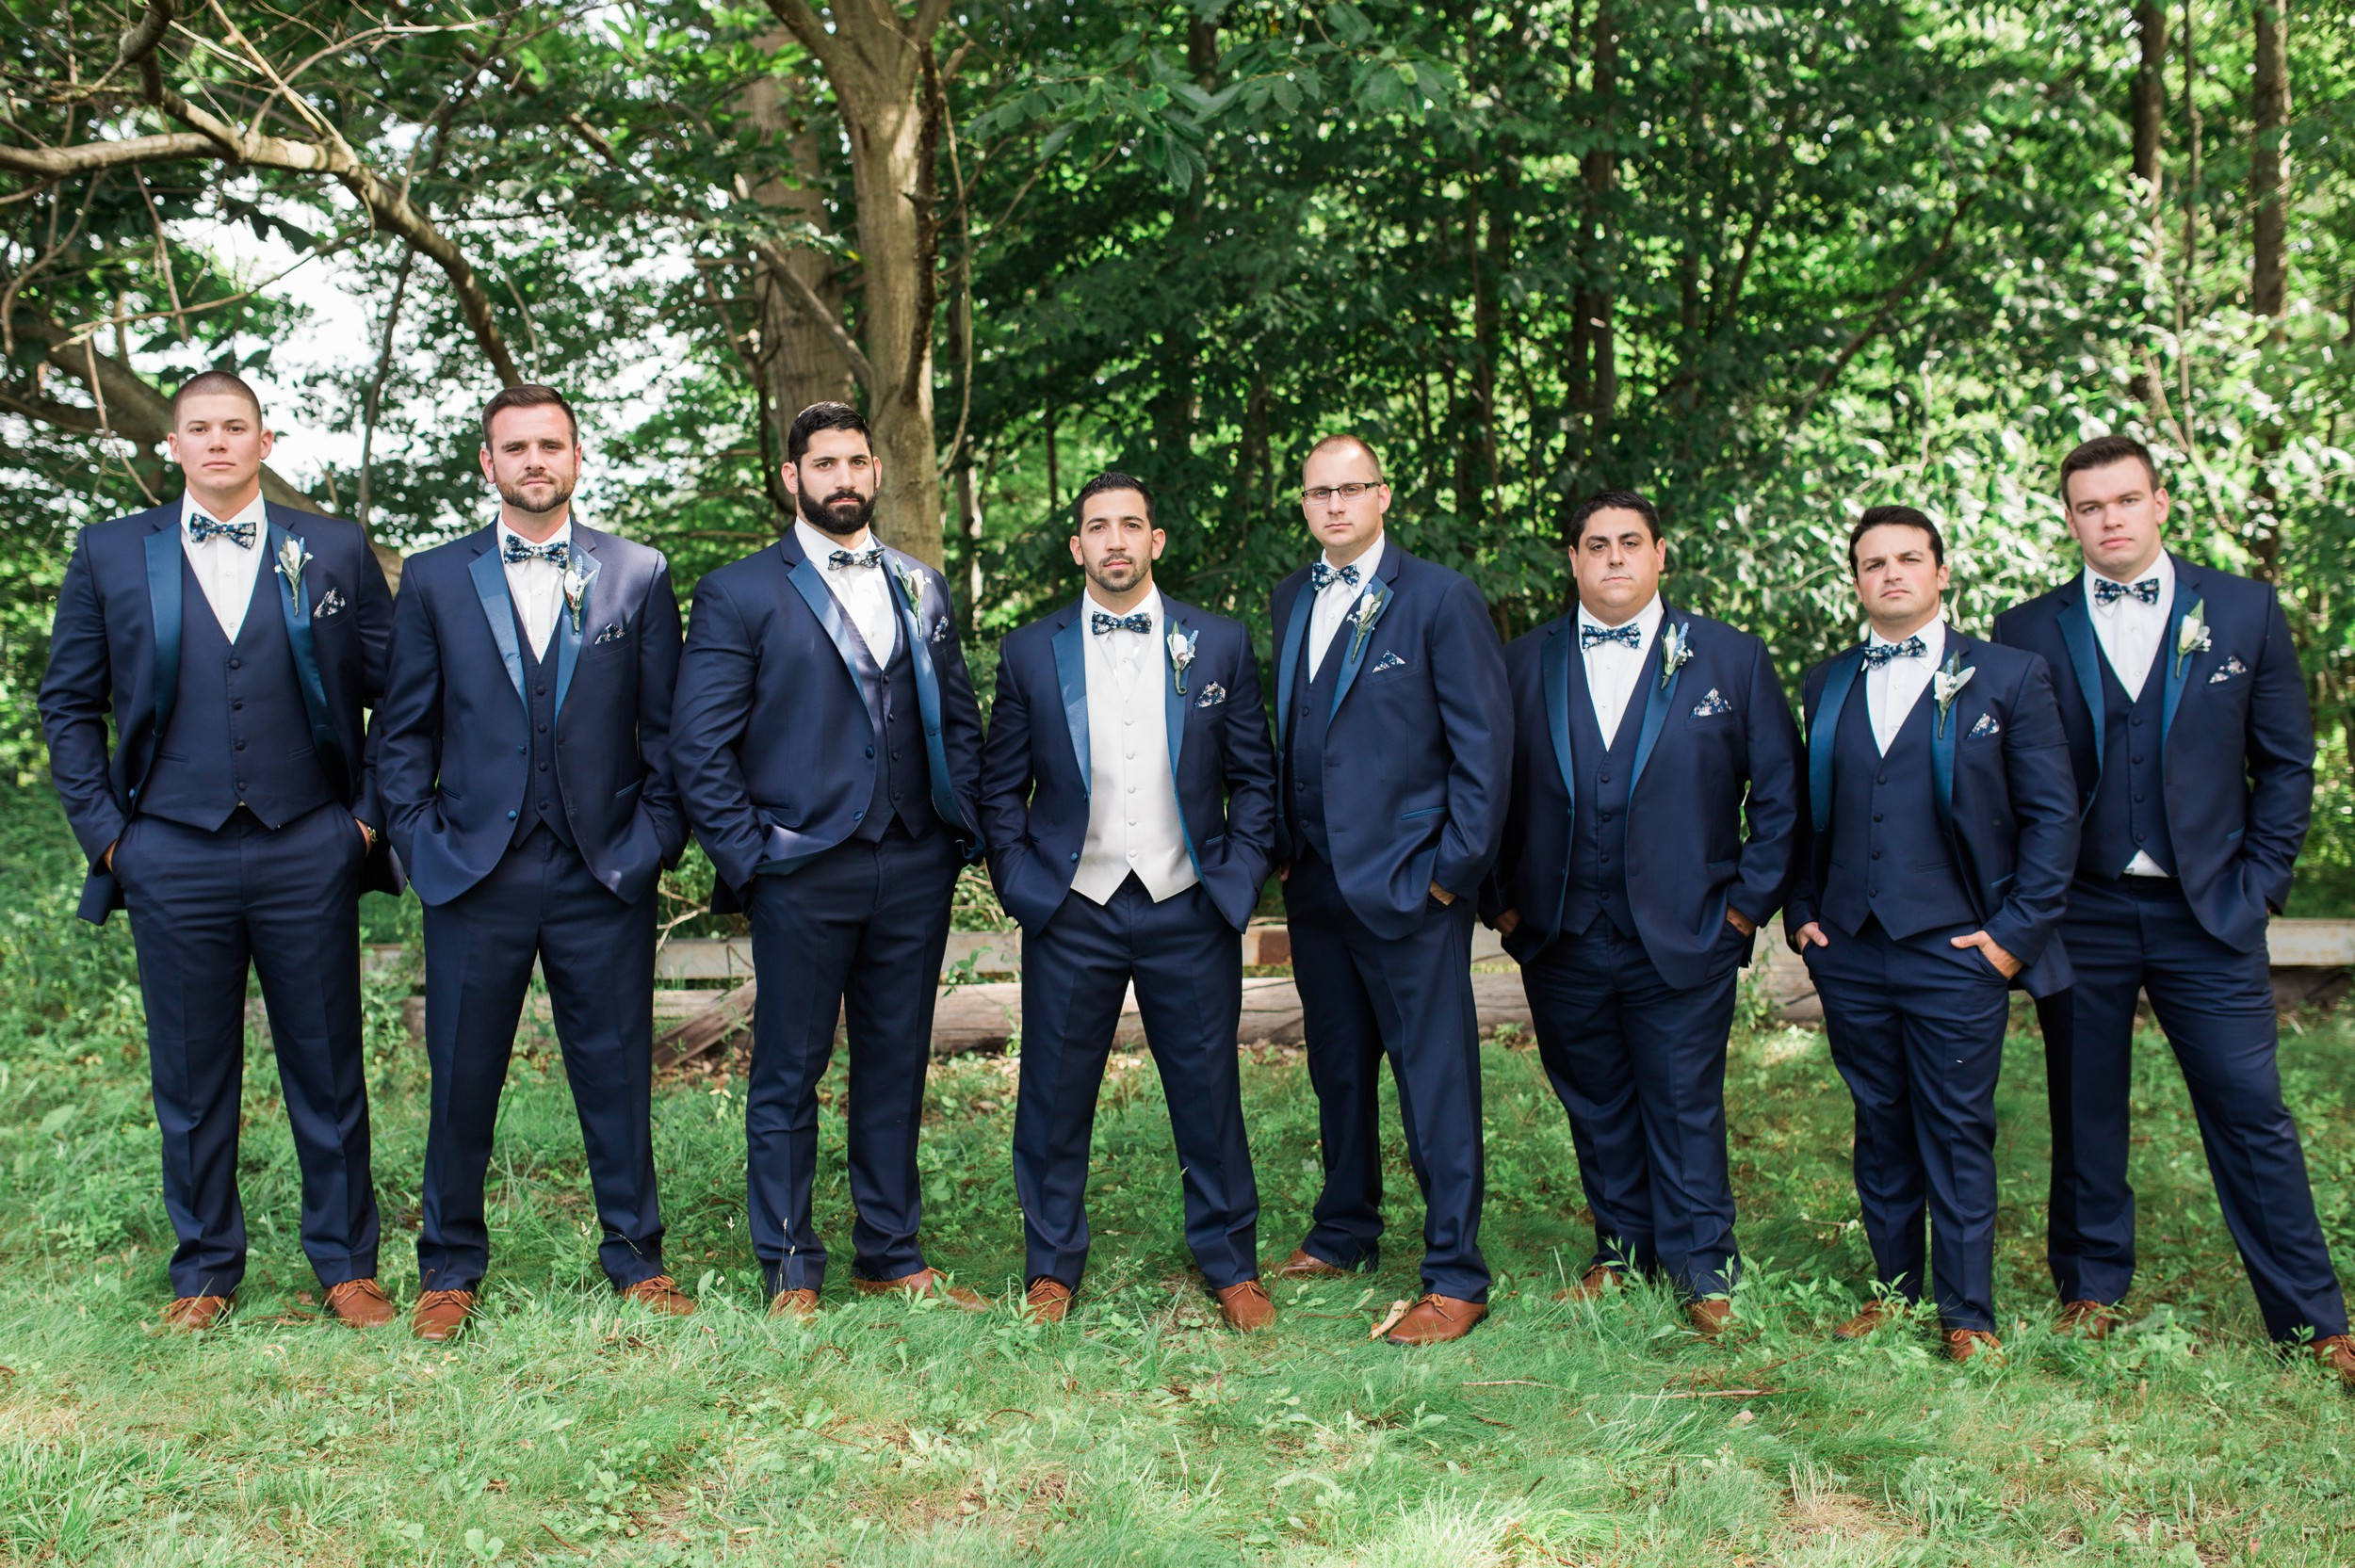 Nick-and-martina-pinelake-vinyards-wedding-columbiana-ohio-tracylynn-photography 12.jpg